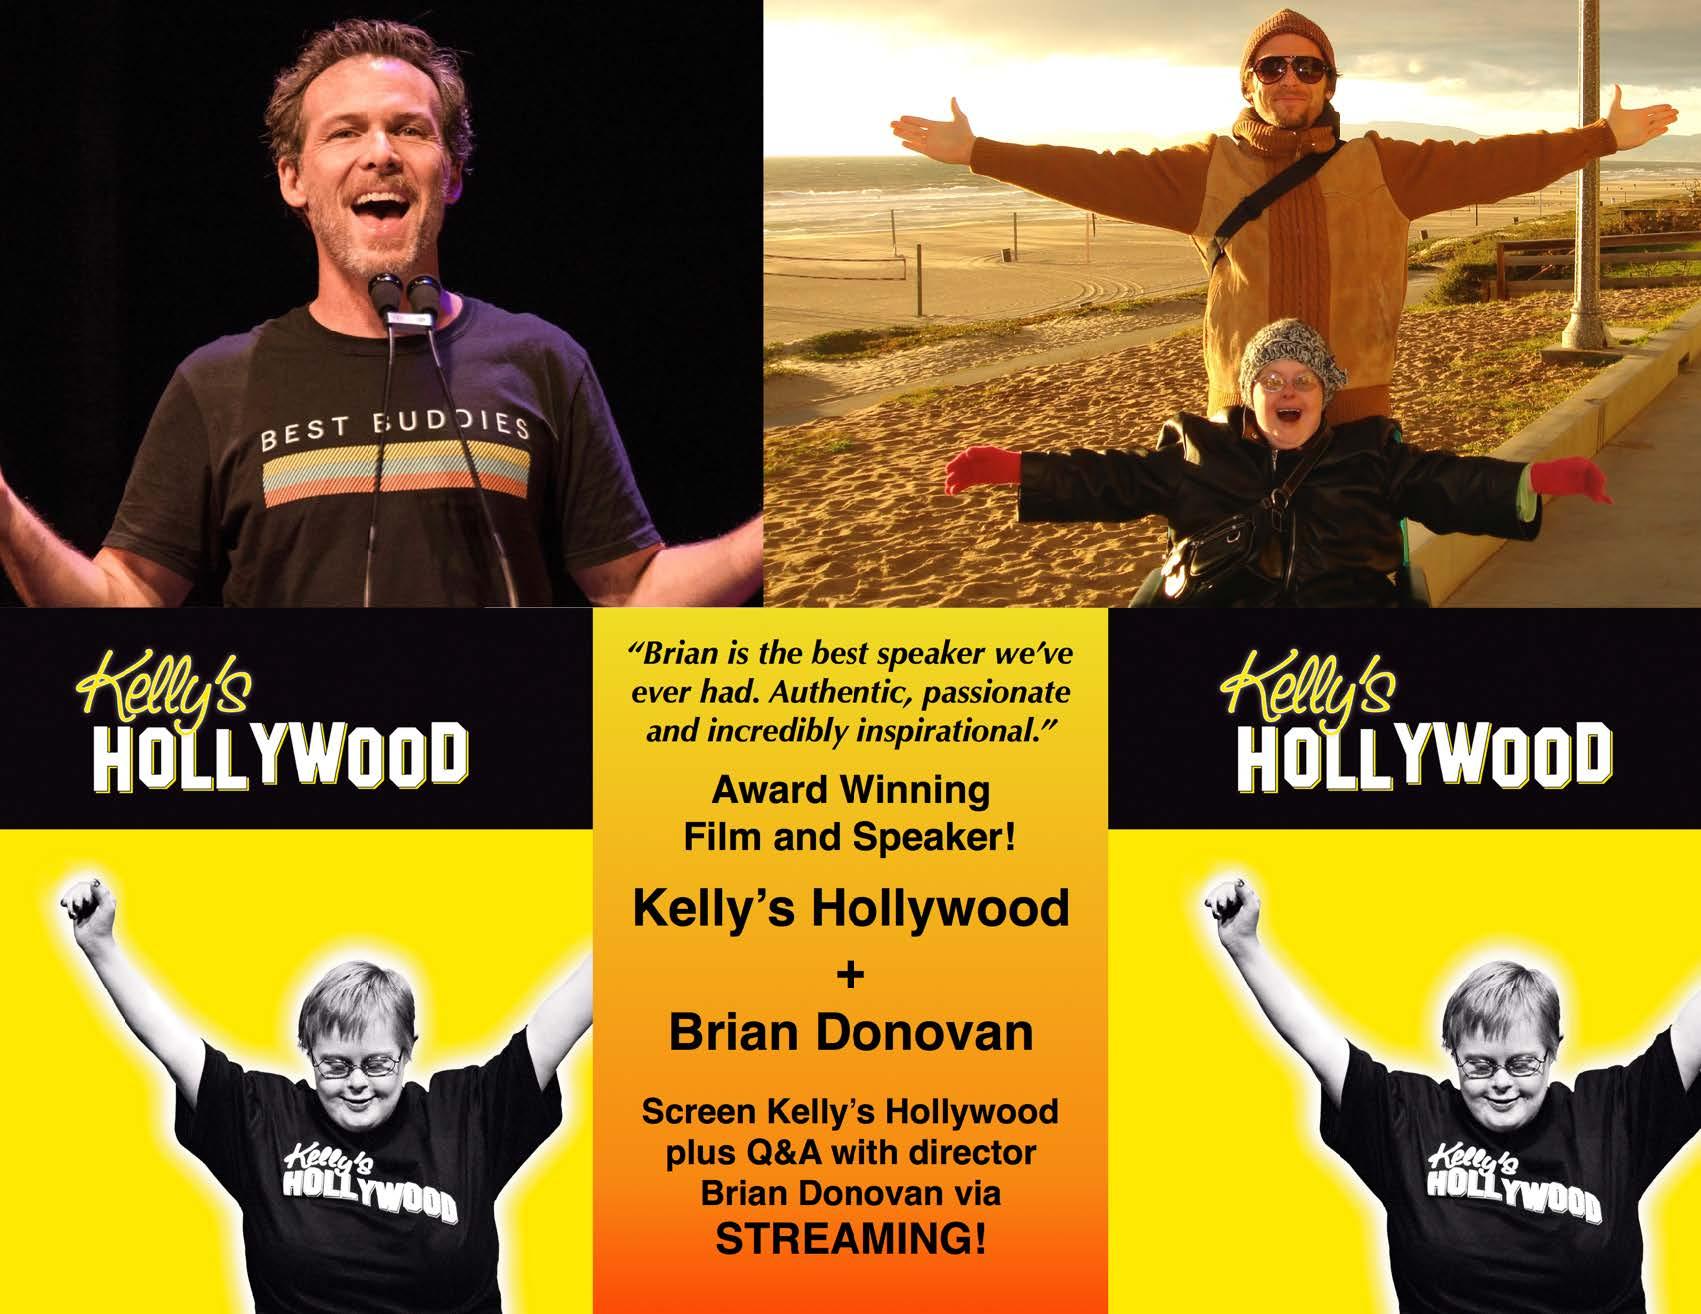 Kelly's Hollywood Promo